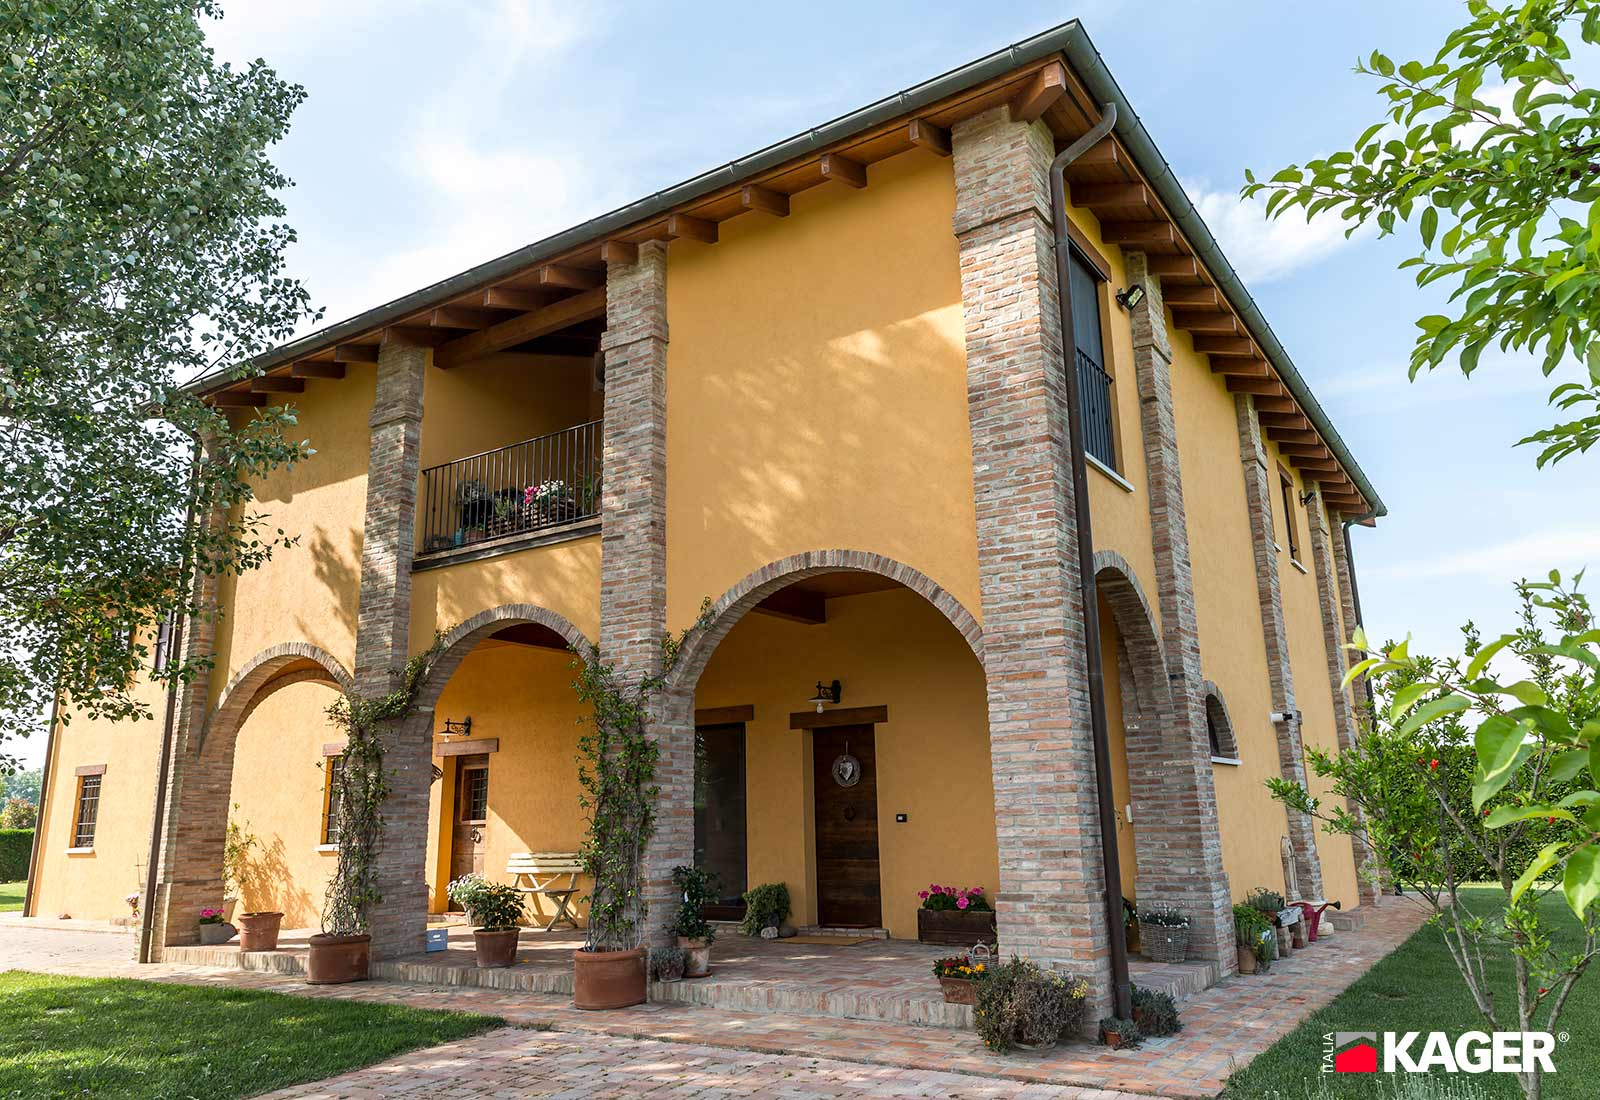 Casa-in-legno-Ferrara-Kager-Italia-06